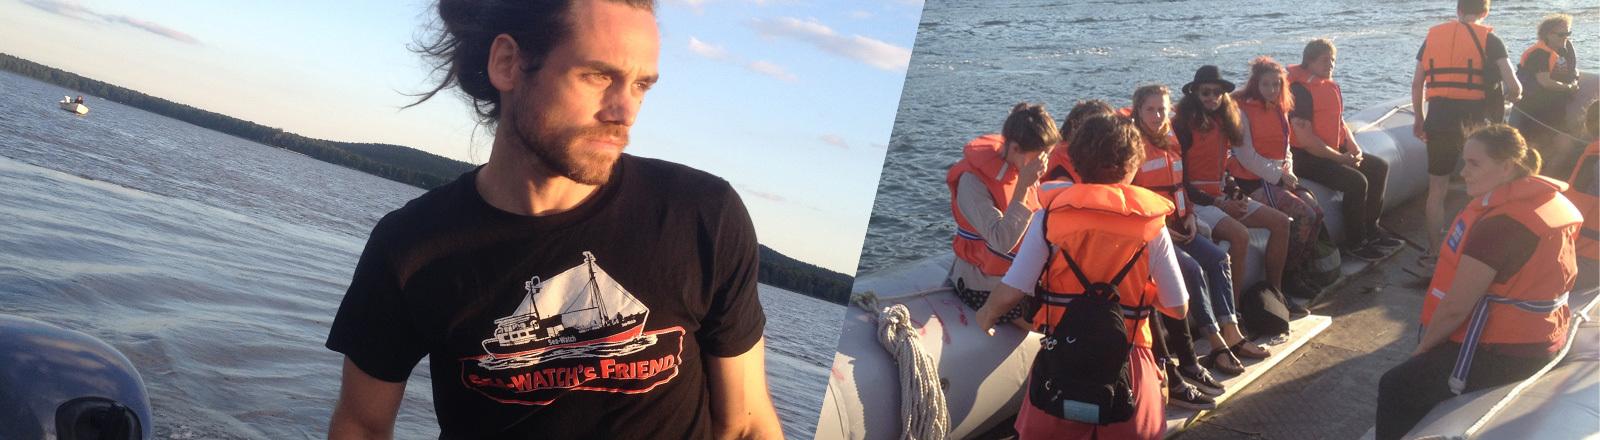 Peter Lanz in einem Flüchtlingsboot.